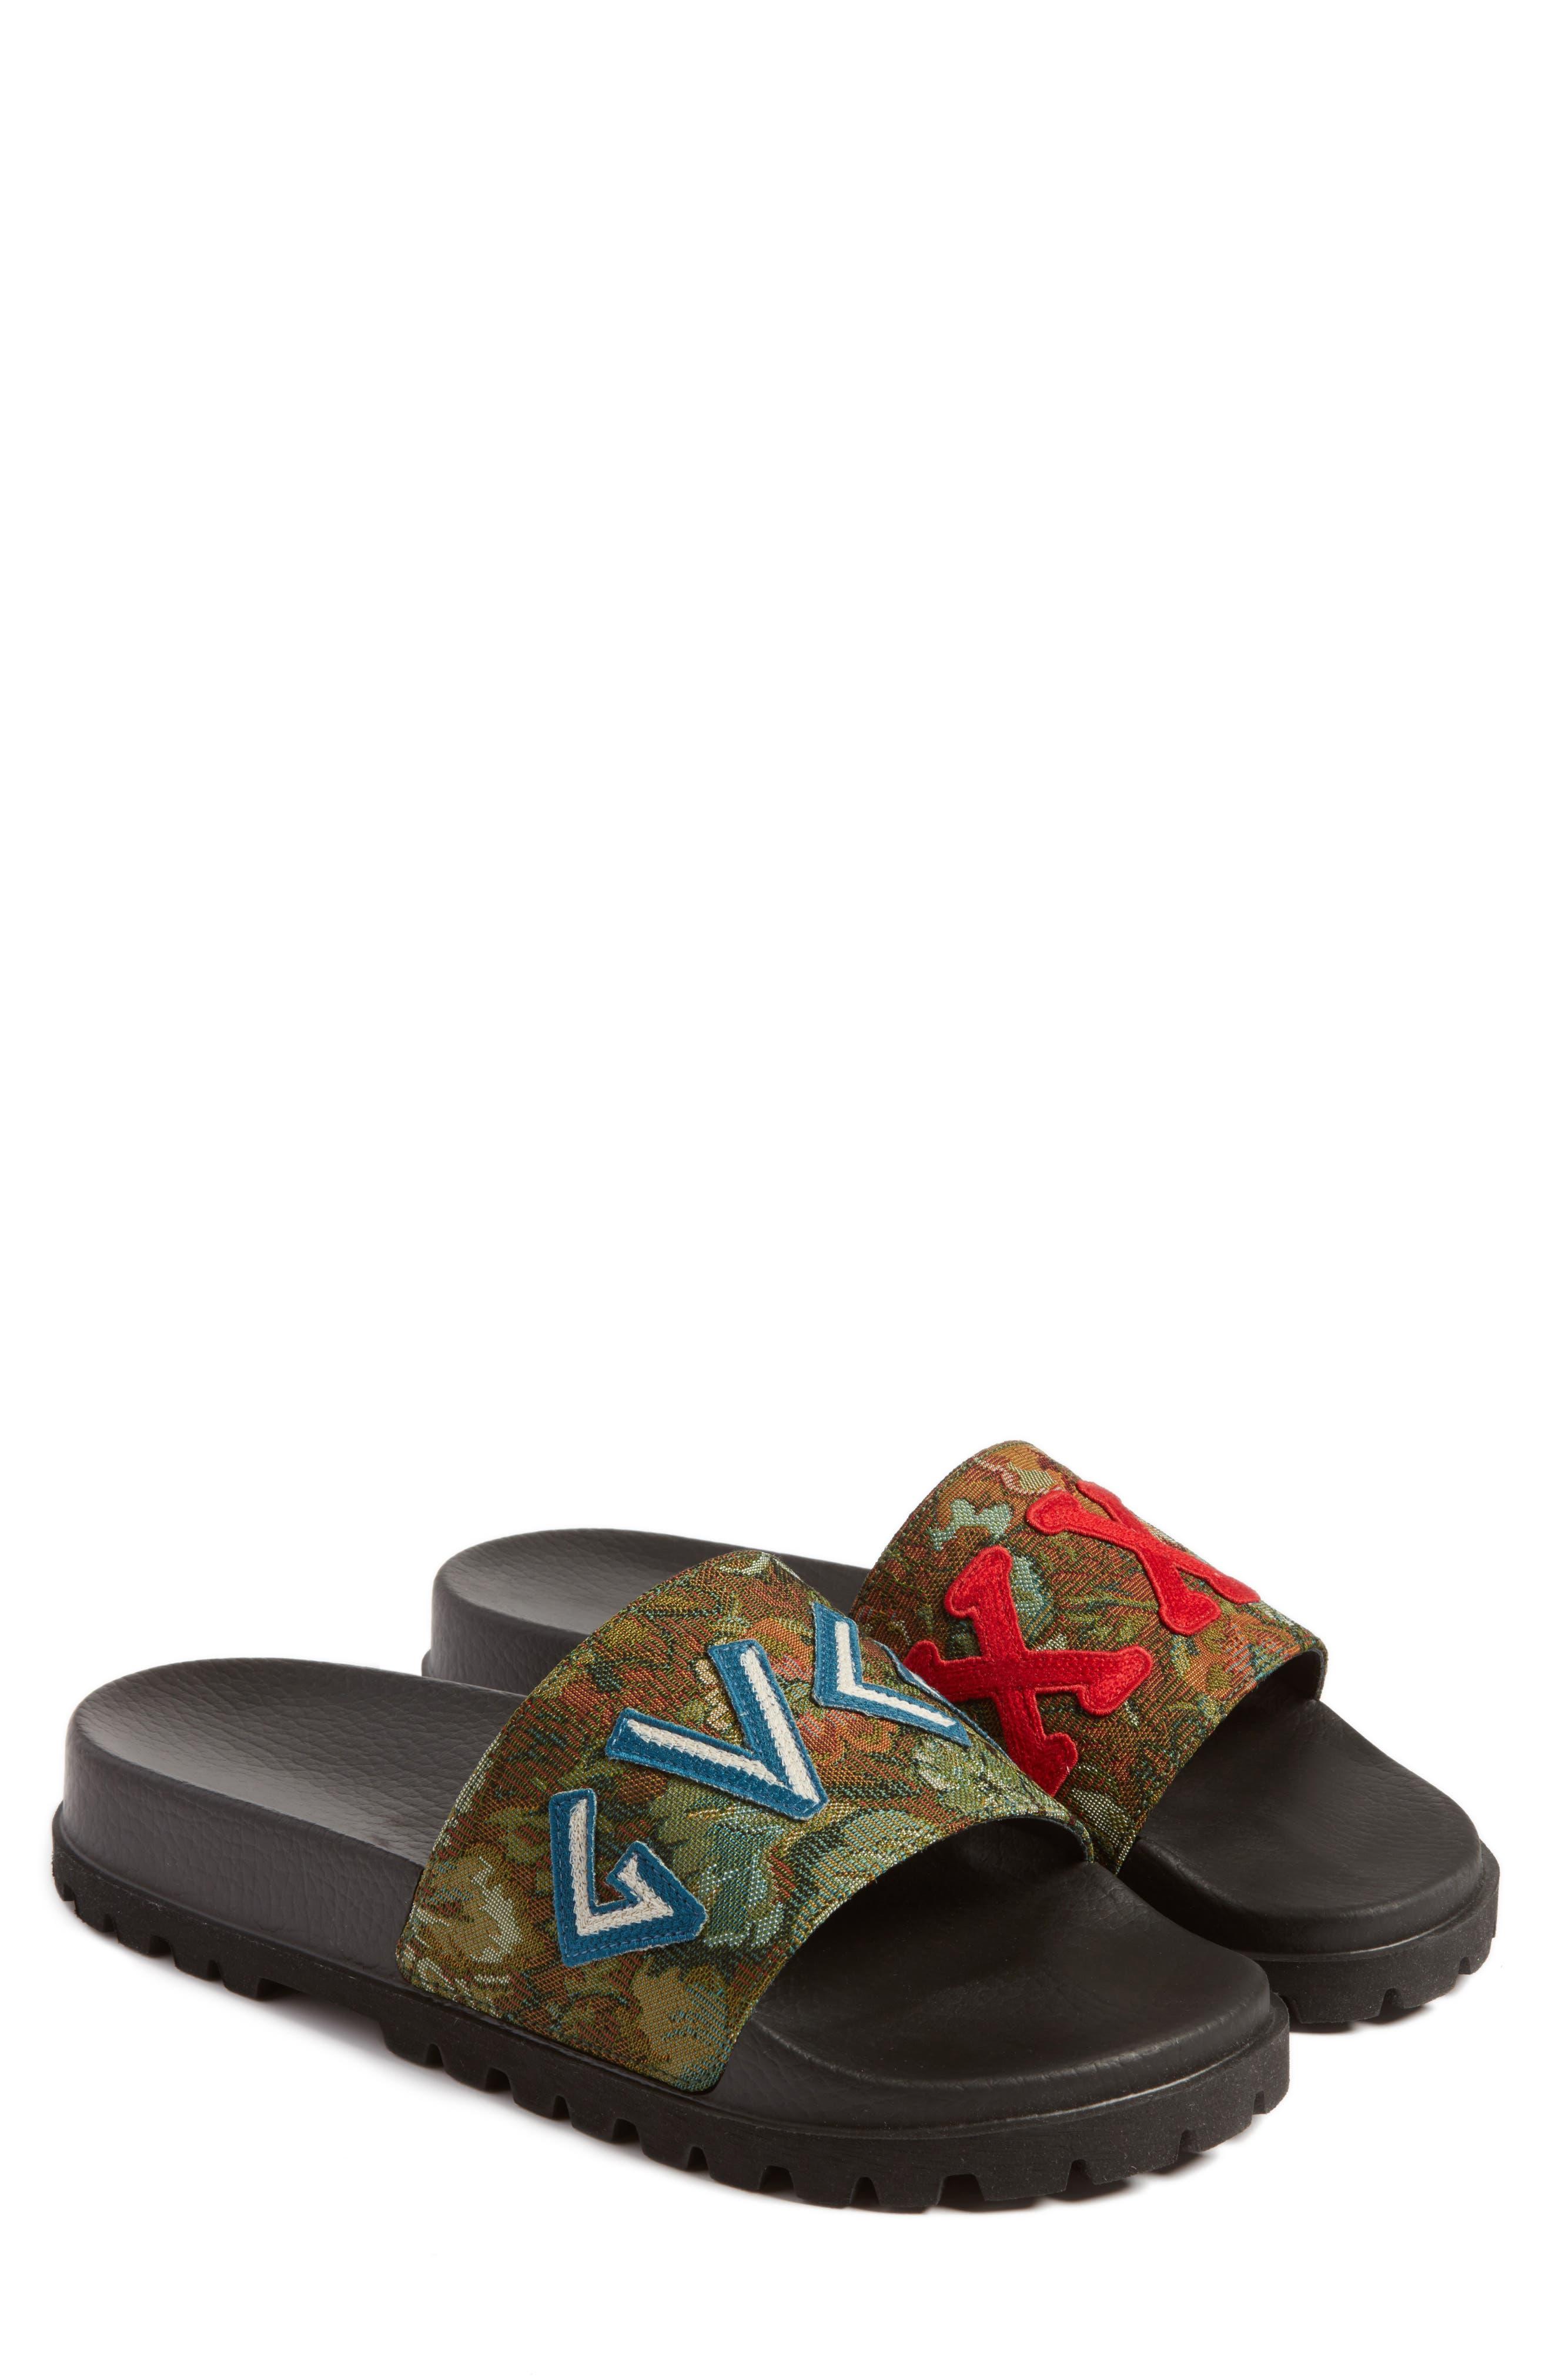 'Pursuit Treck' Slide Sandal,                             Main thumbnail 1, color,                             Green Multi